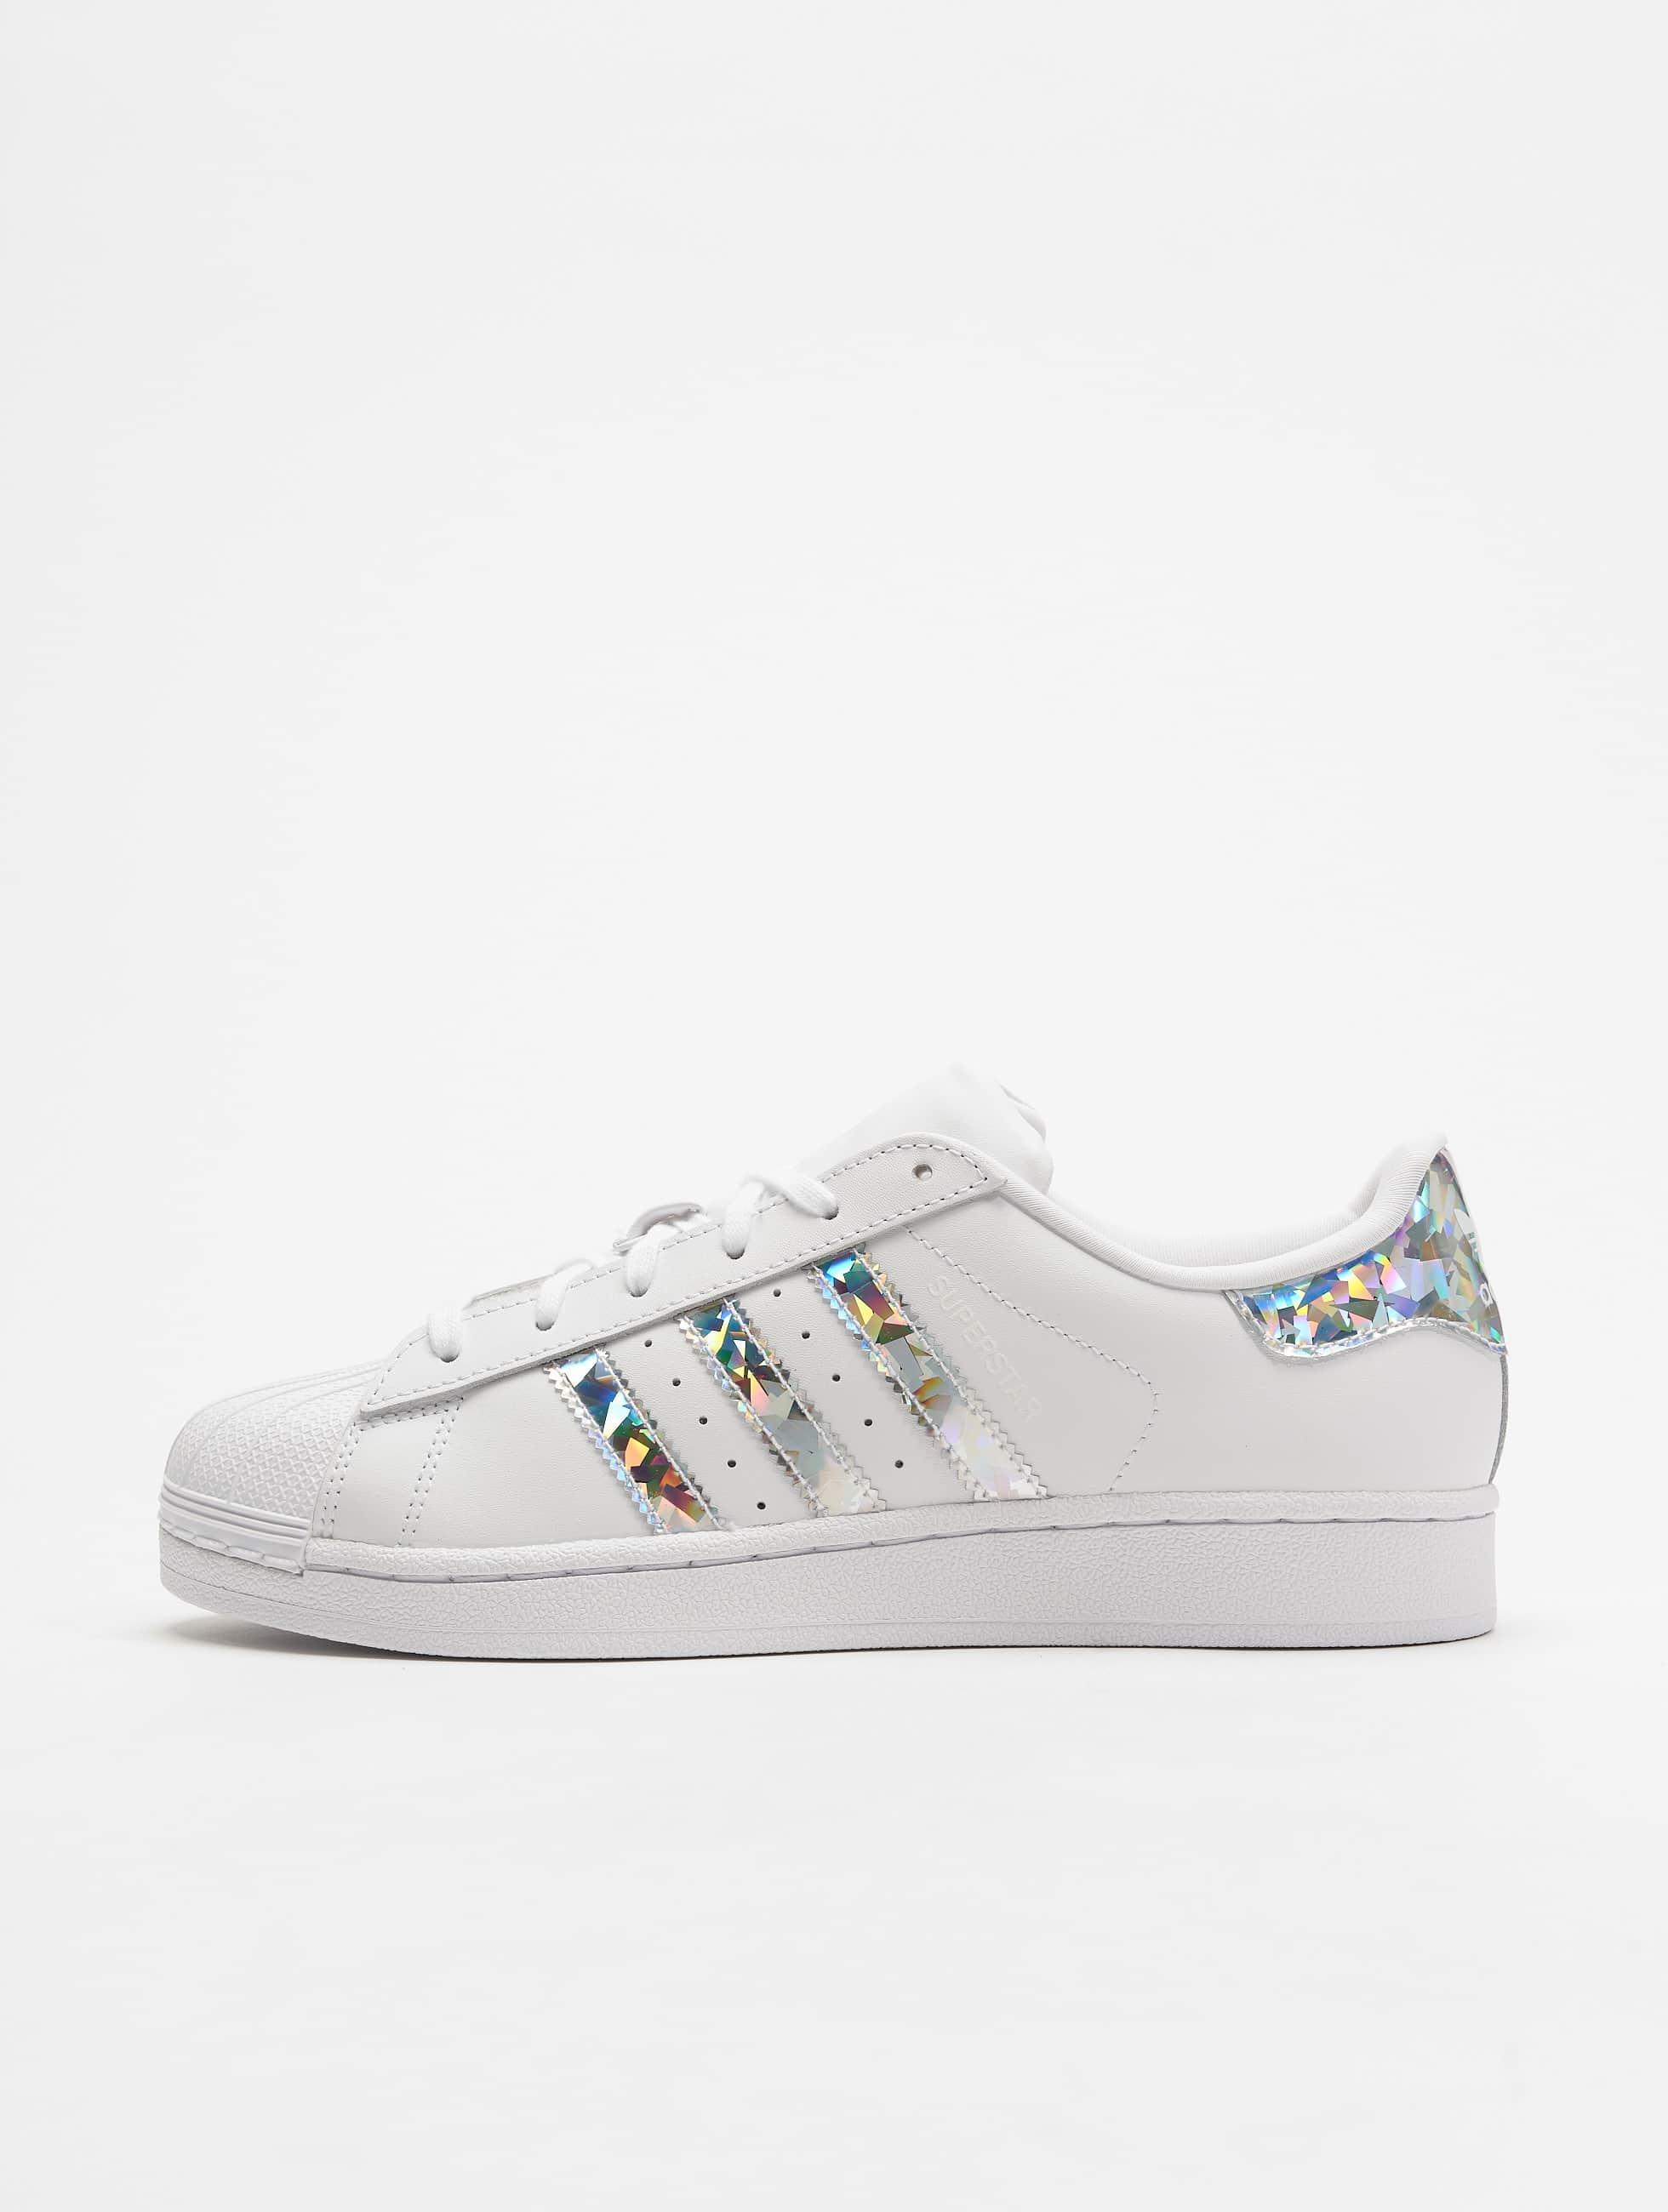 Adidas Originals Superstar J Sneakers Ftwr White